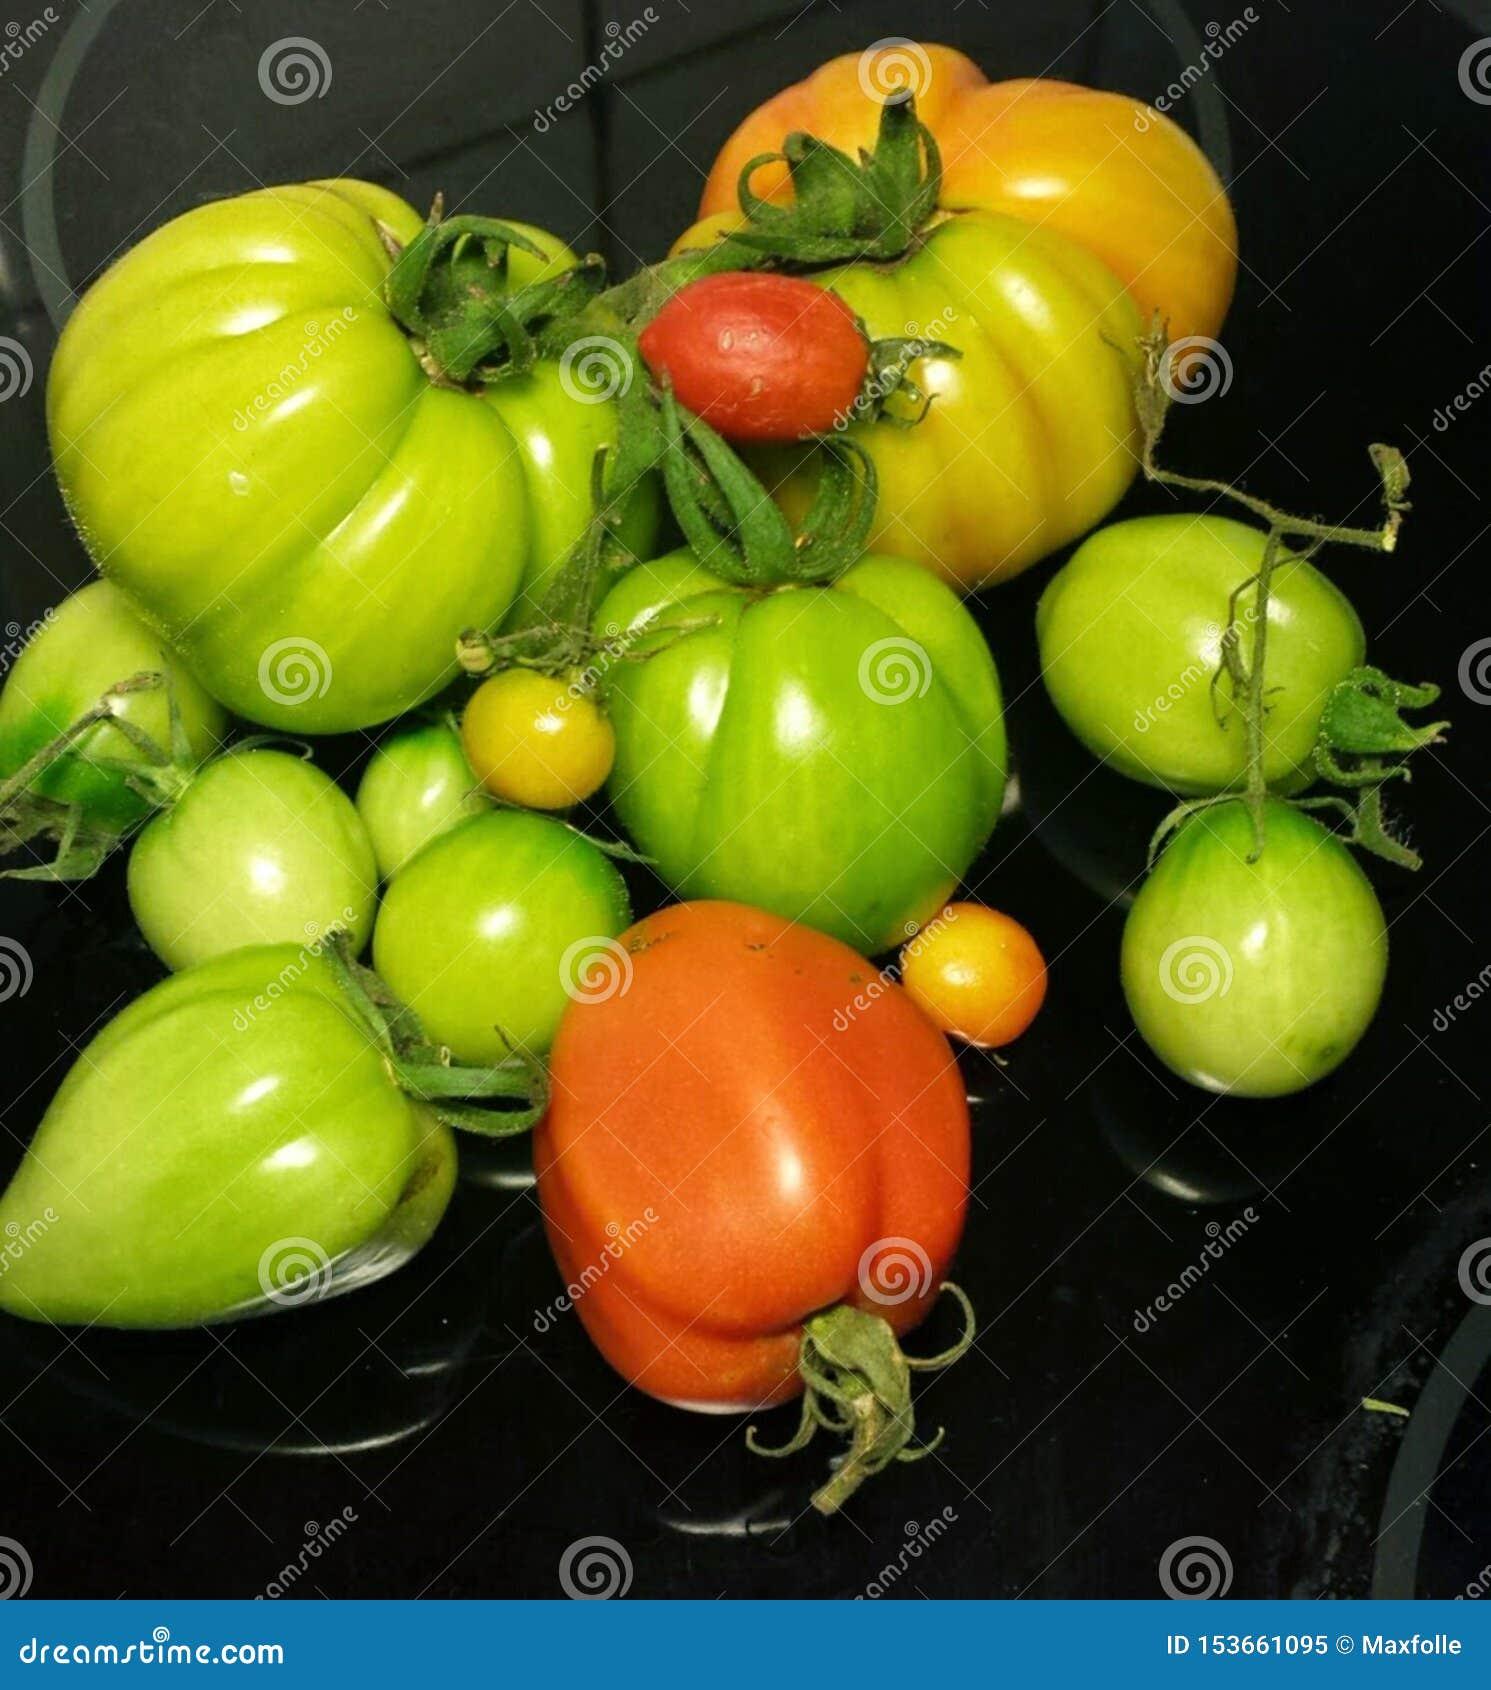 Photographs of popular ingredients in Italian cuisine